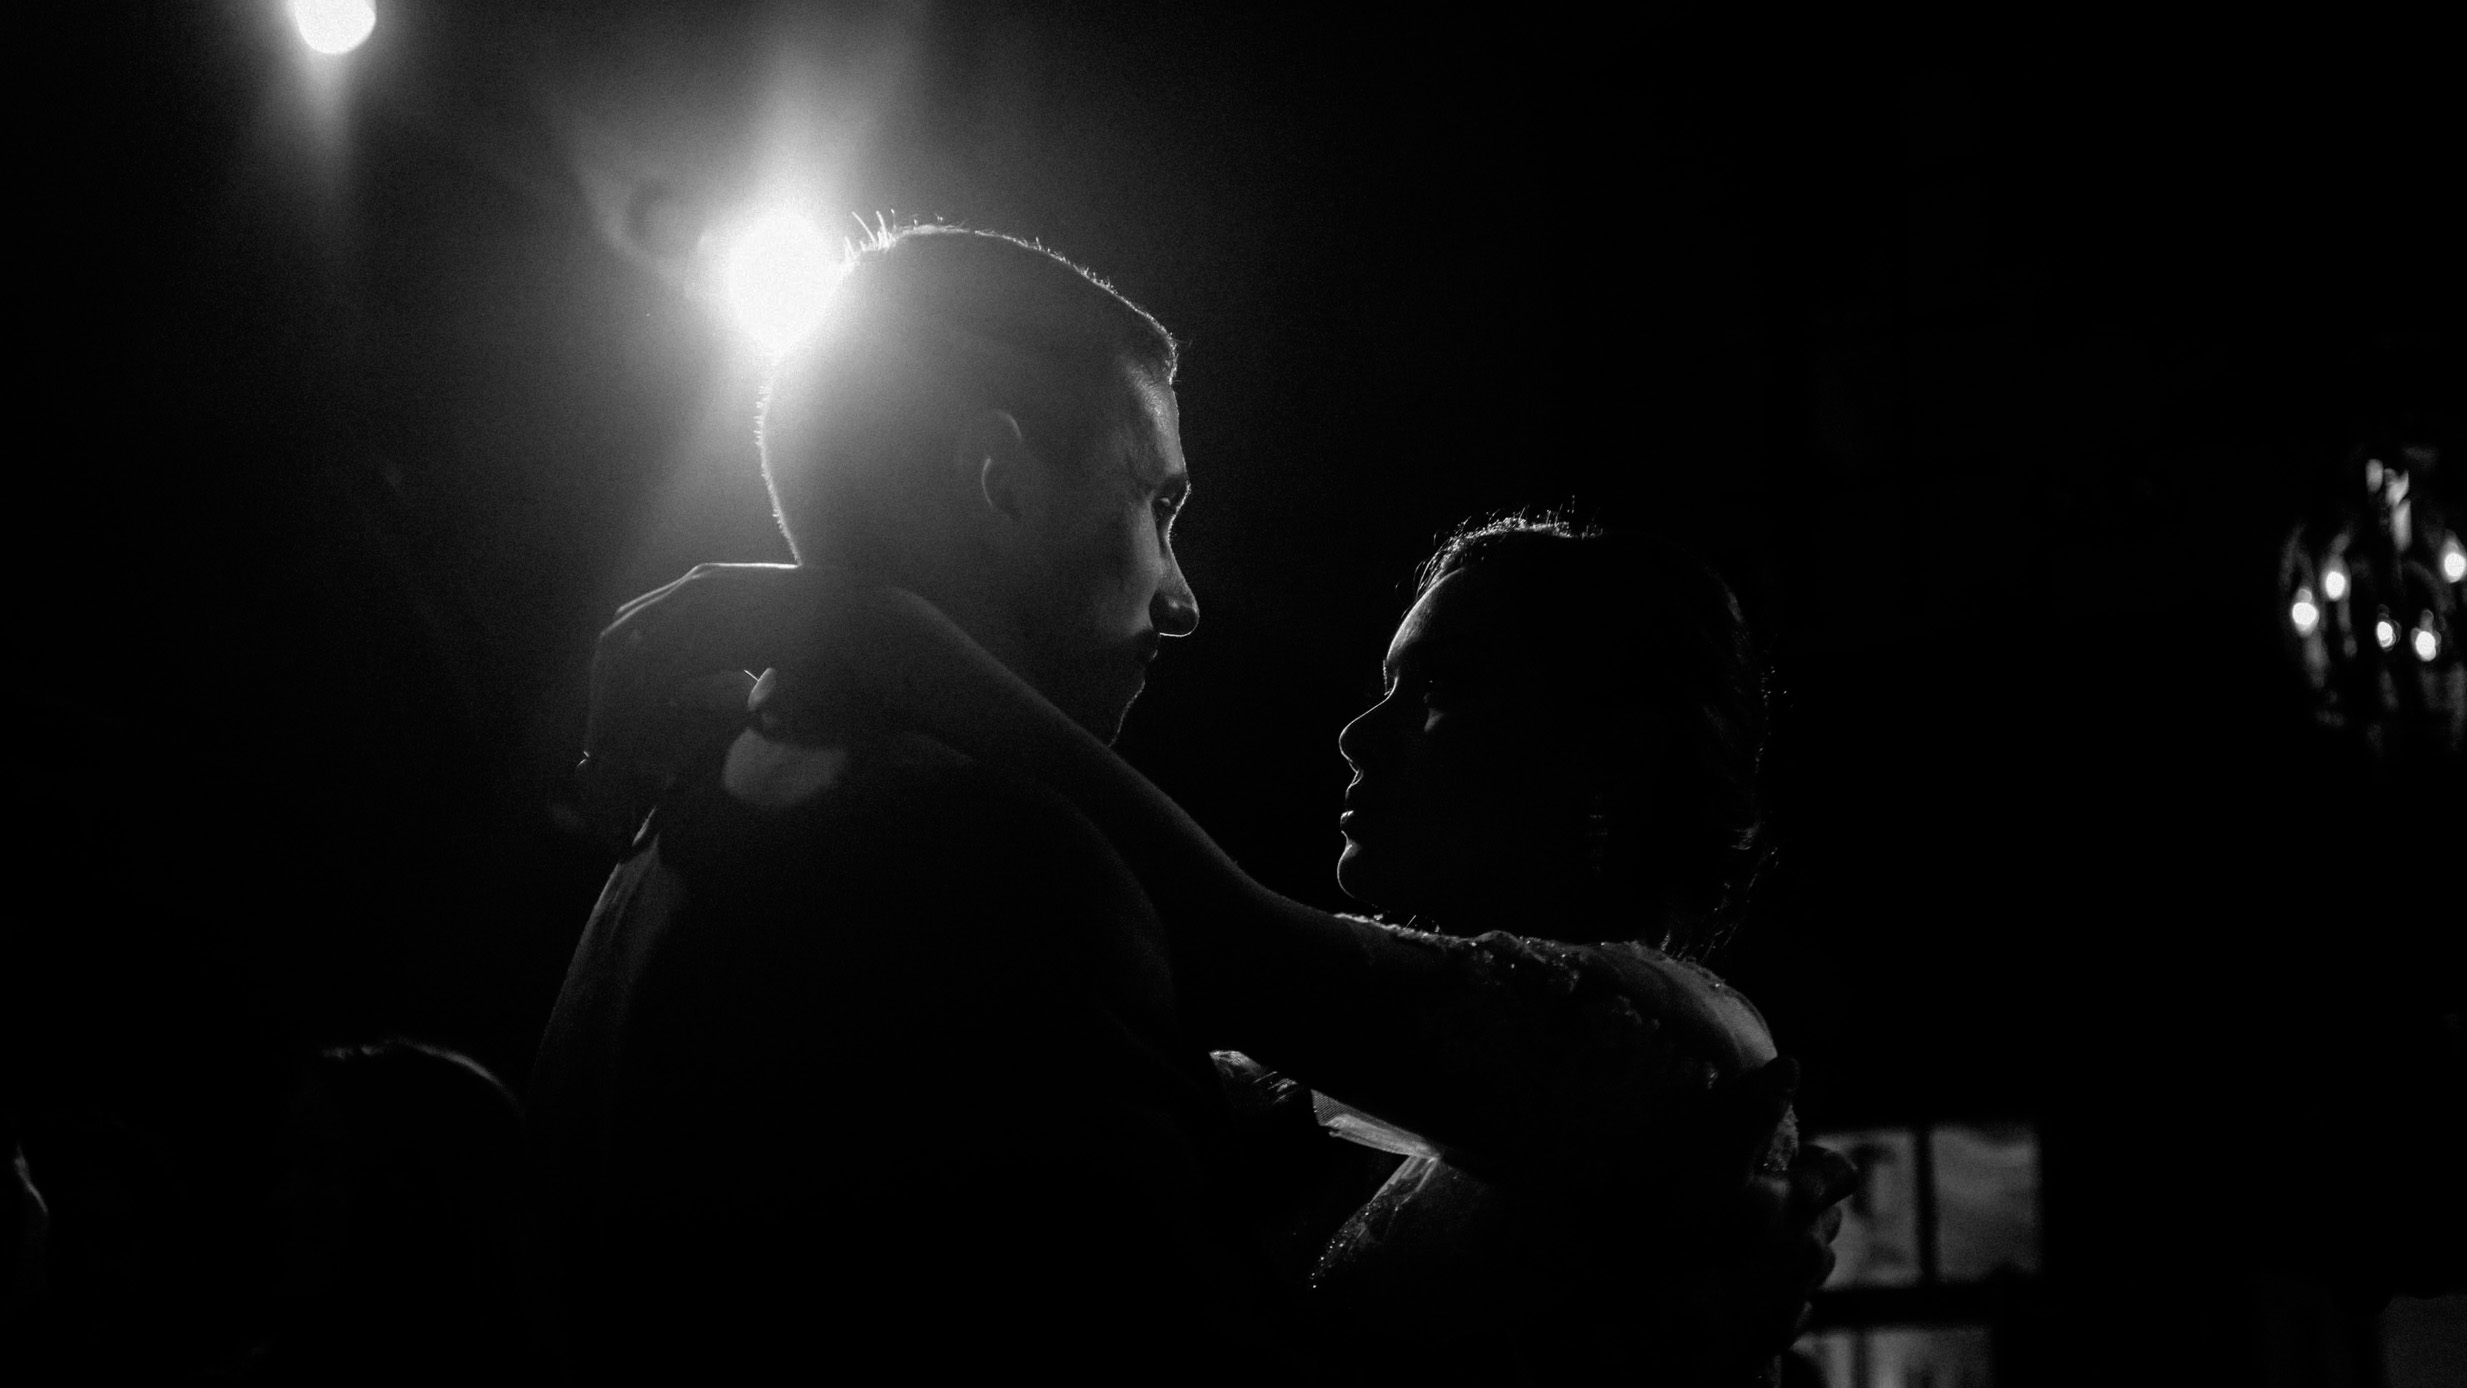 dc+metro+wedding+photographer+vadym+guliuk+photography+wedding+first+dance-2025.jpg